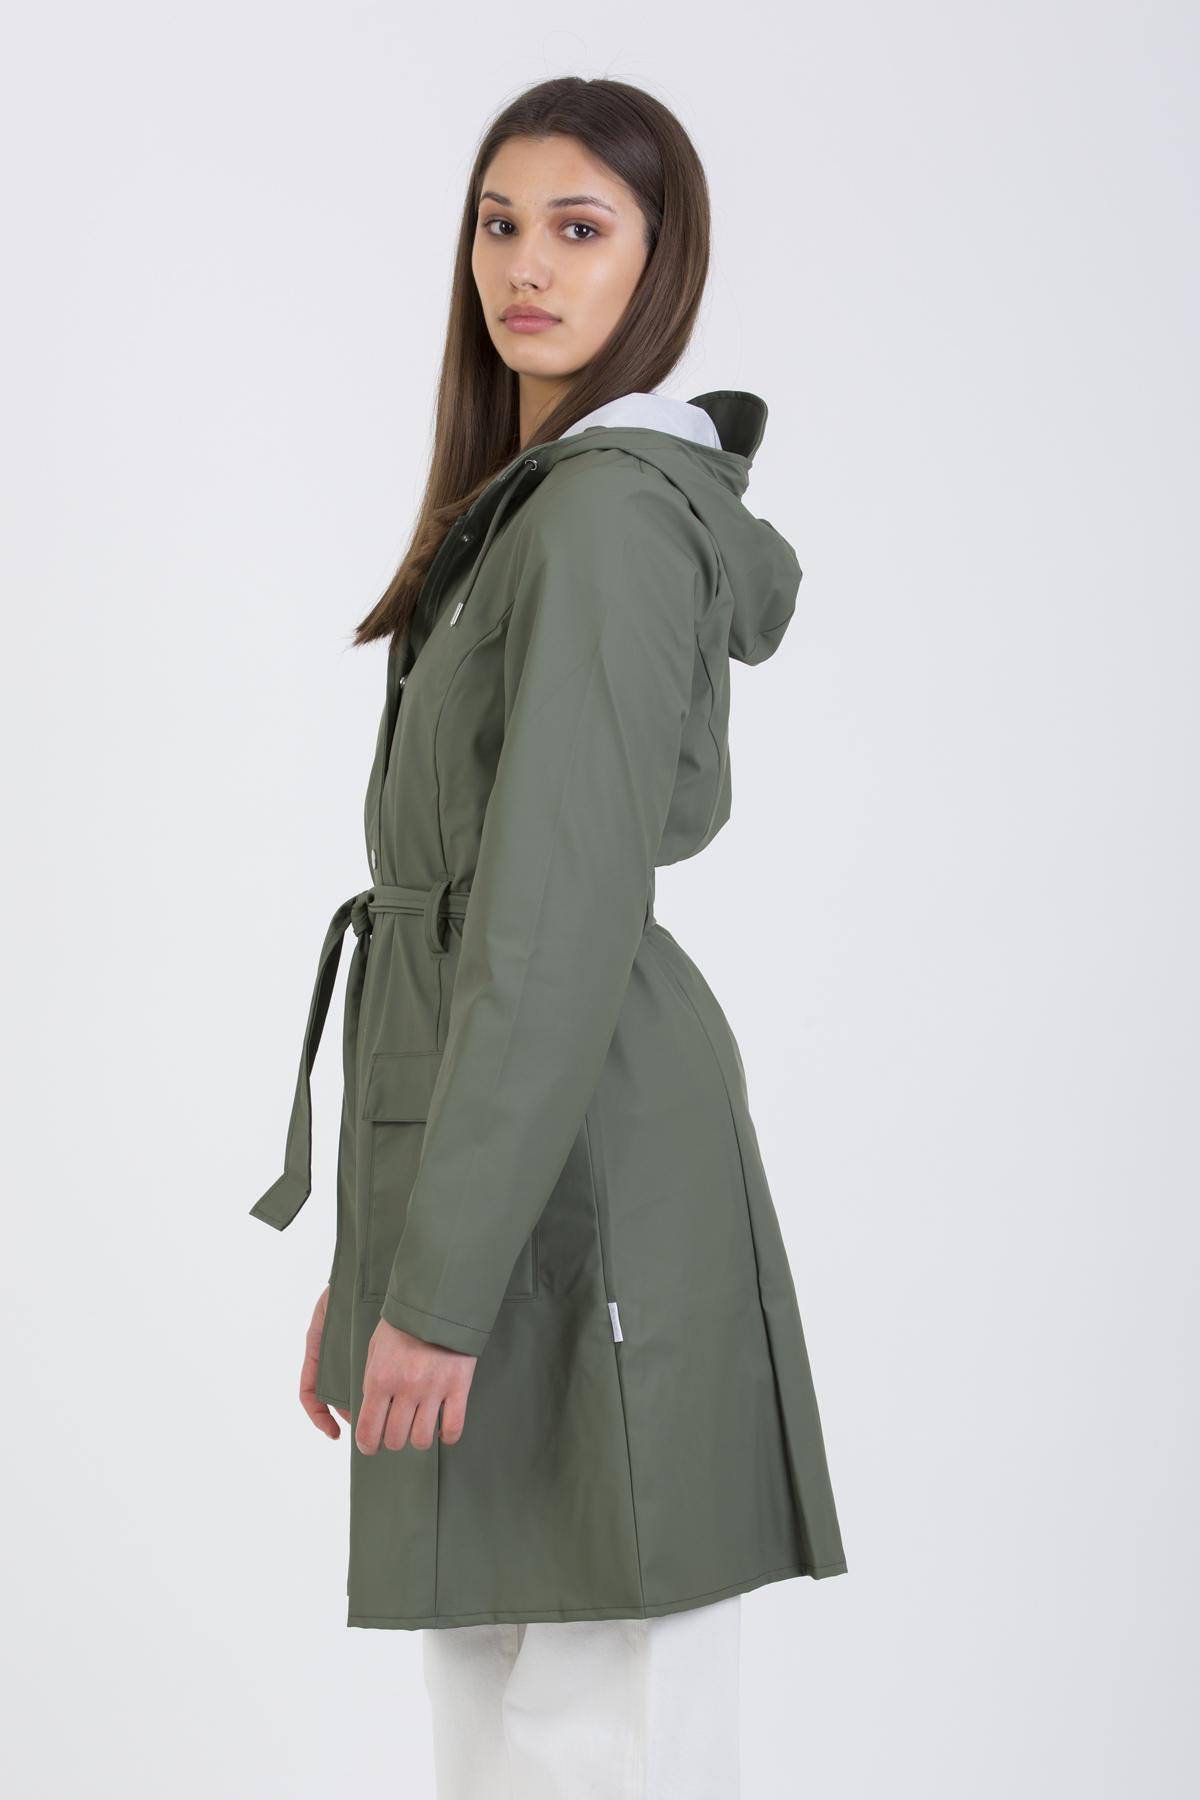 curve-jacket-olive-rains-raincoat-matchboxathens